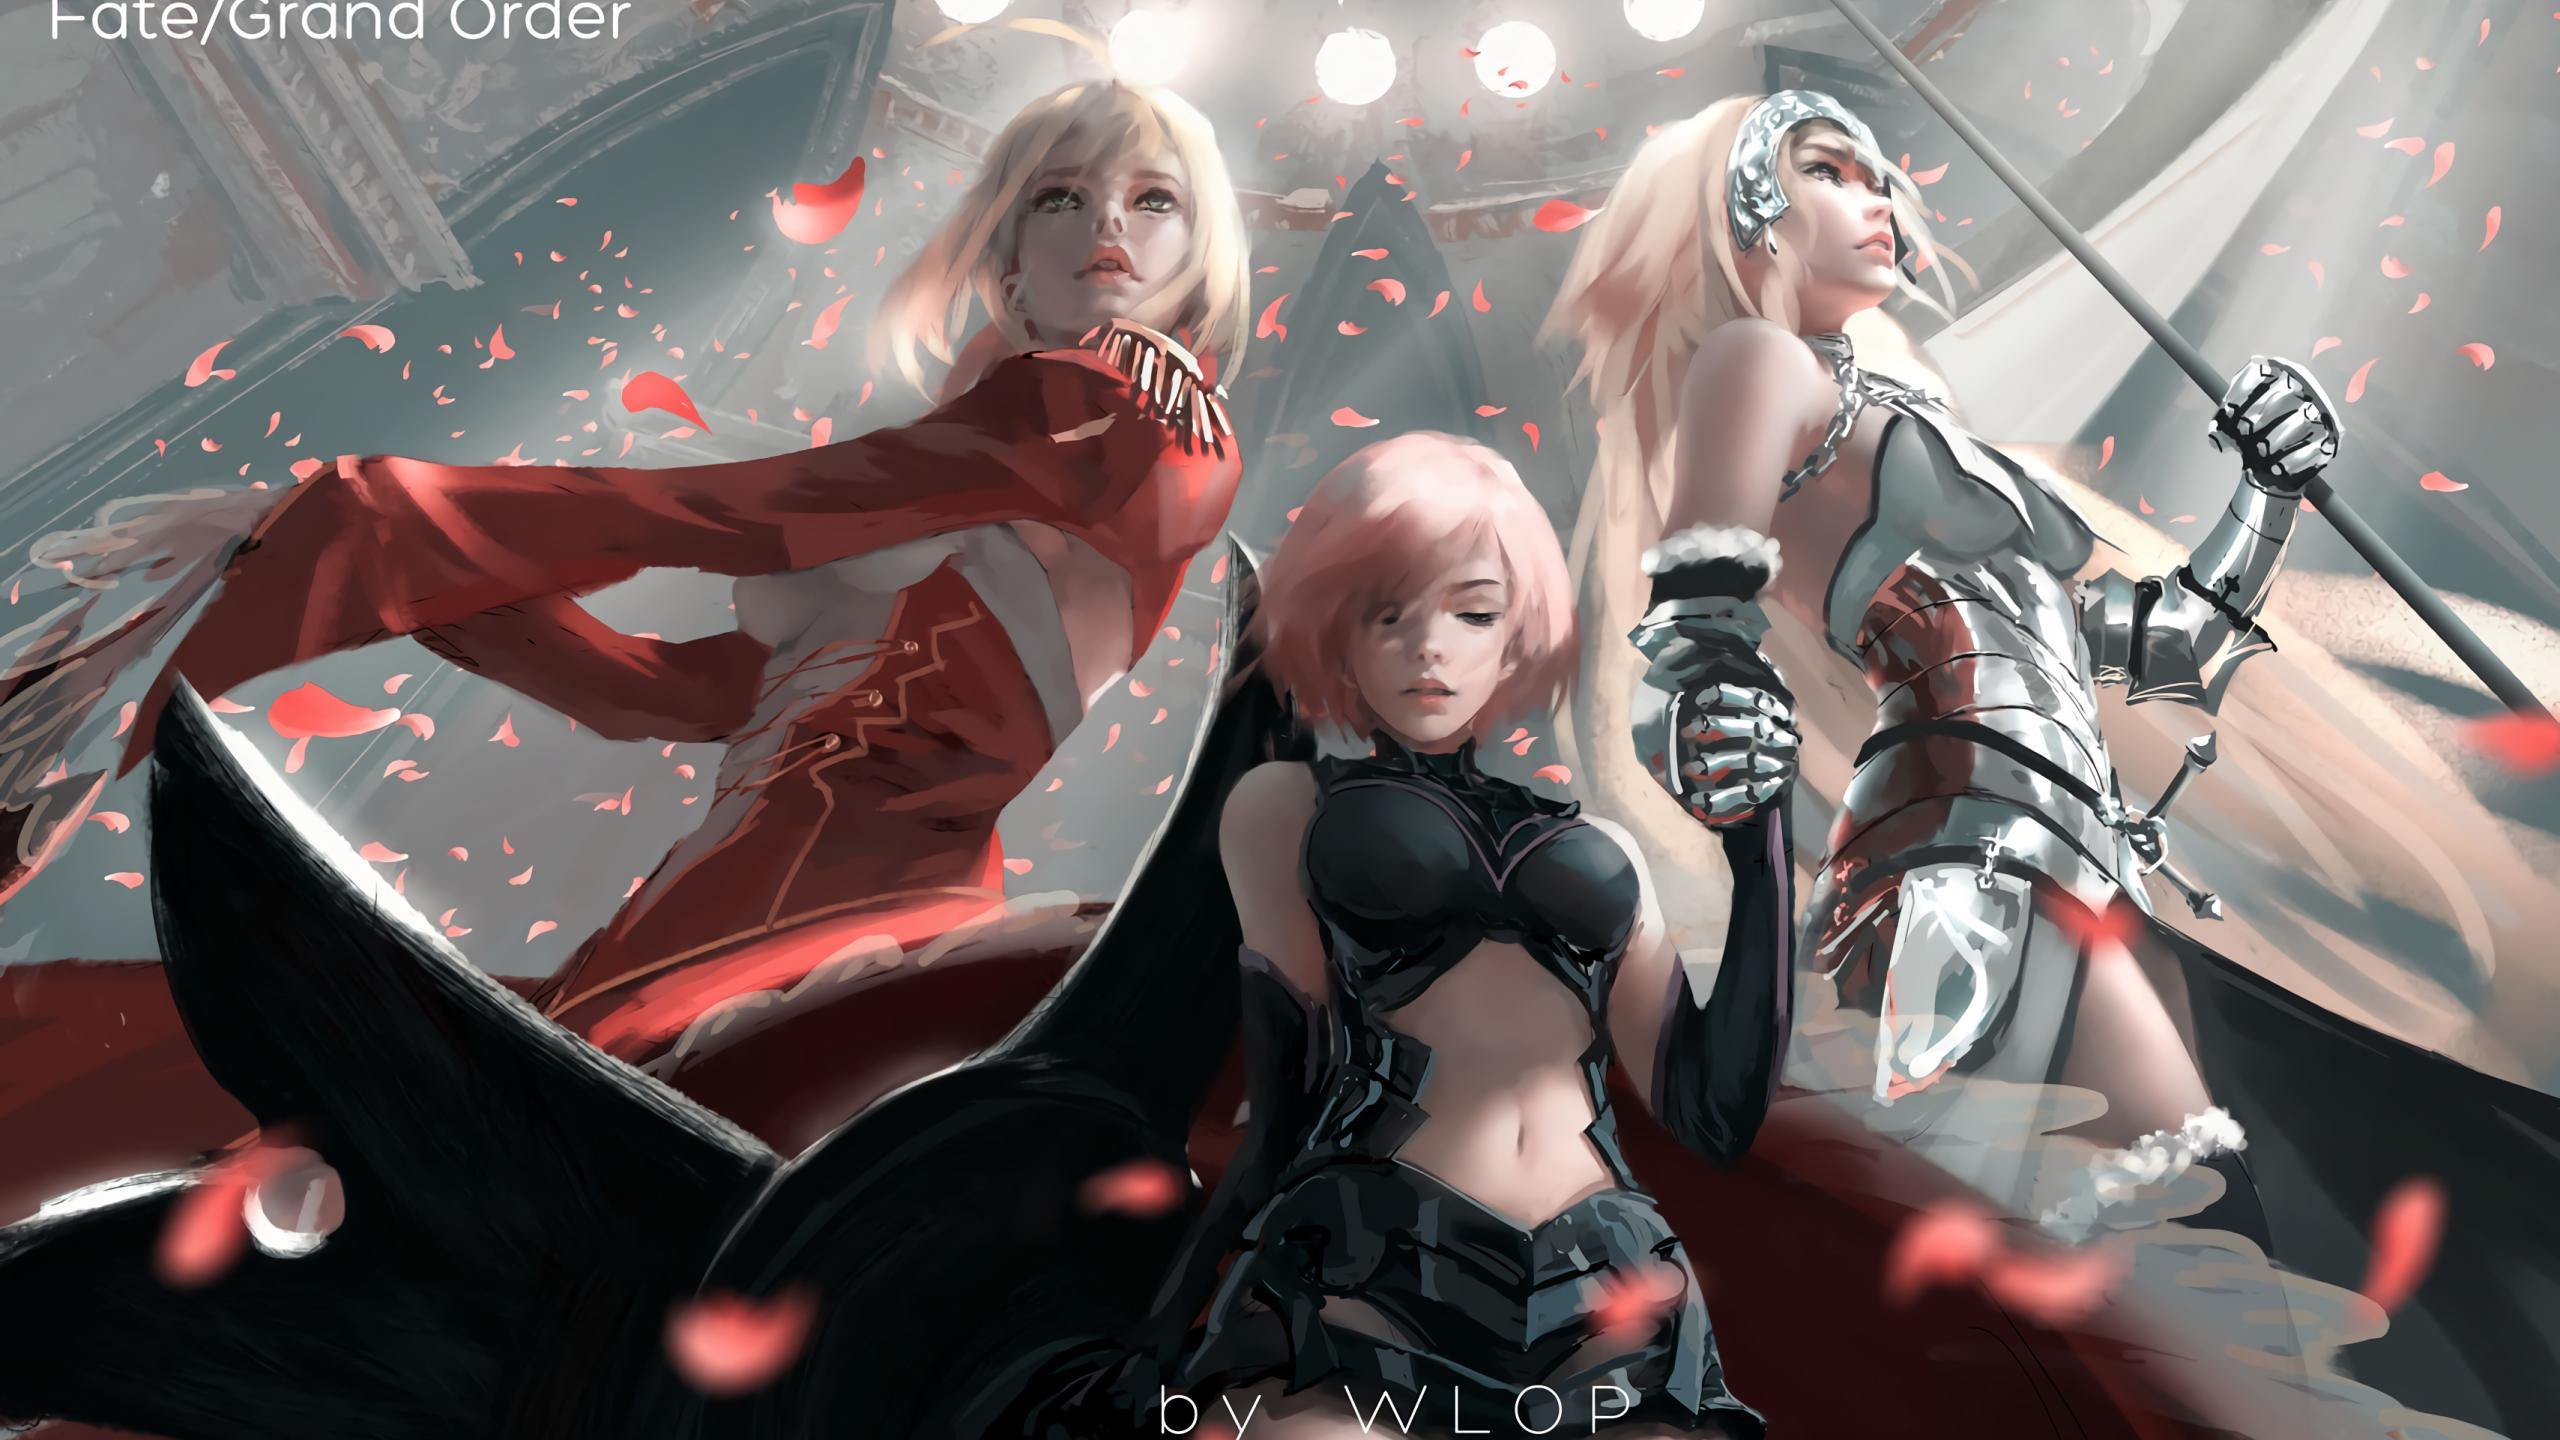 2560x1440 Fate Grand Order 1440p Resolution Wallpaper Hd Anime 4k